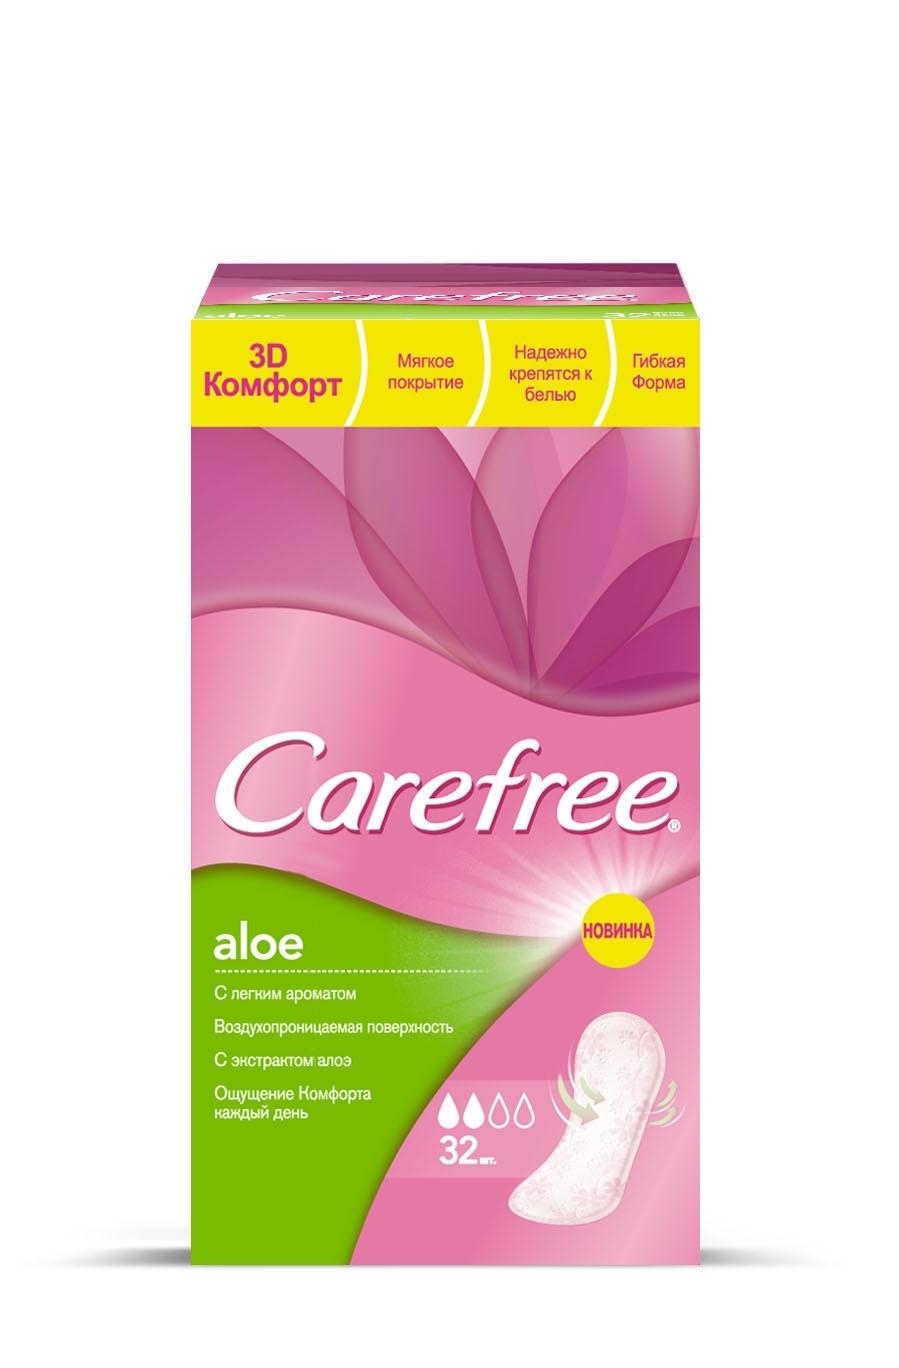 Ежедневные салфетки Carefree® Aloe